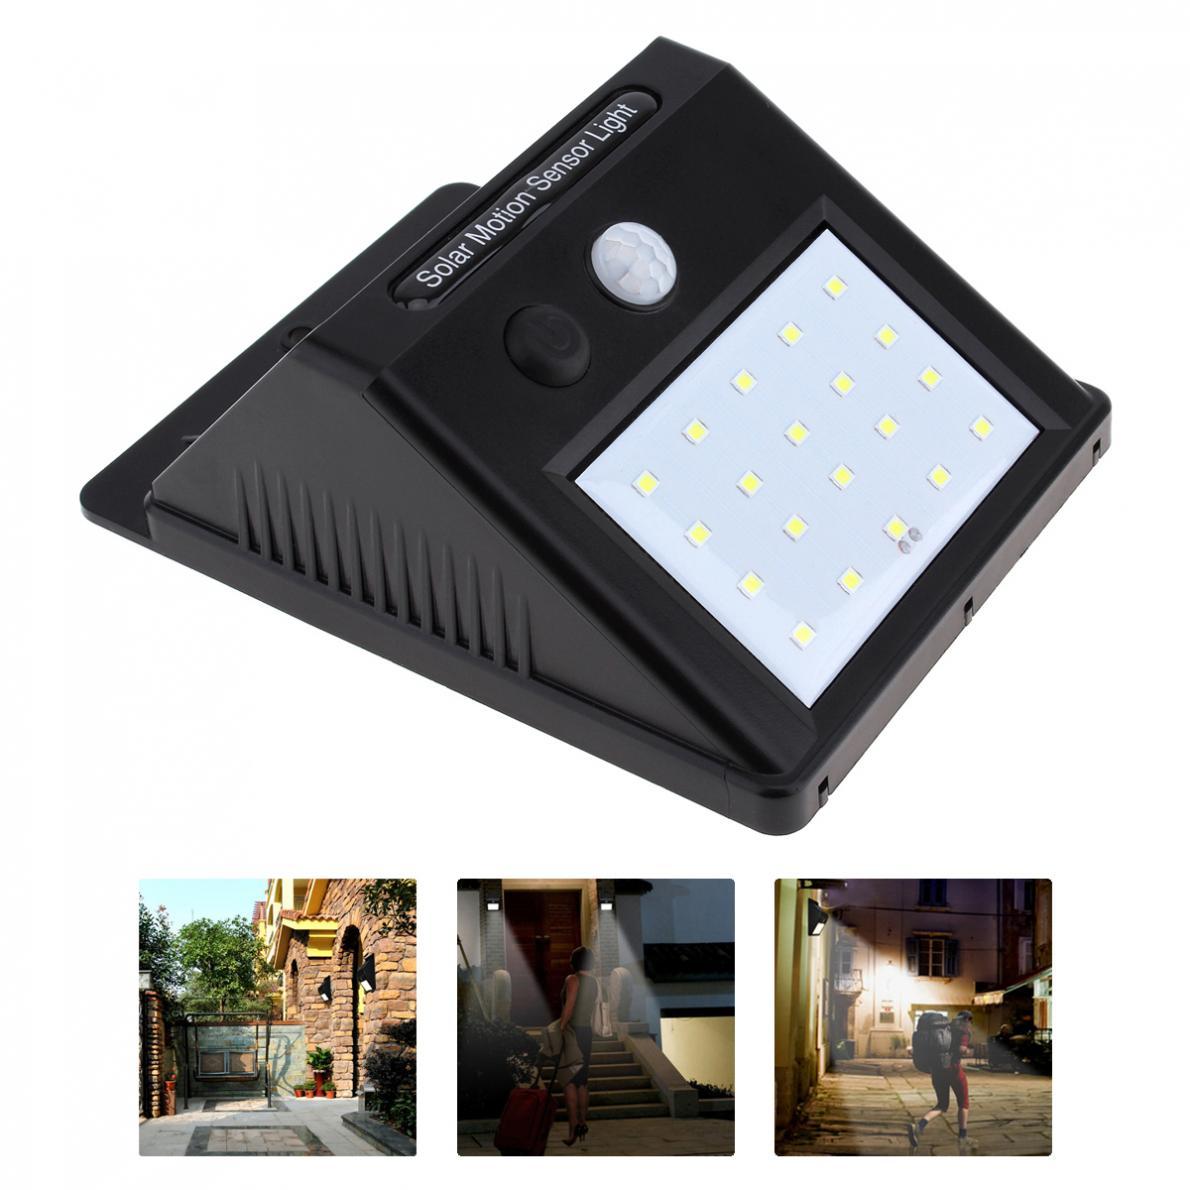 Outdoor Lighting Objective 5pcs/lot Decor Light Bight Outdoor Lighting 8 Led Solar Power Pir Motion Sensor Wall Light Outdoor Waterproof Garden Lamp